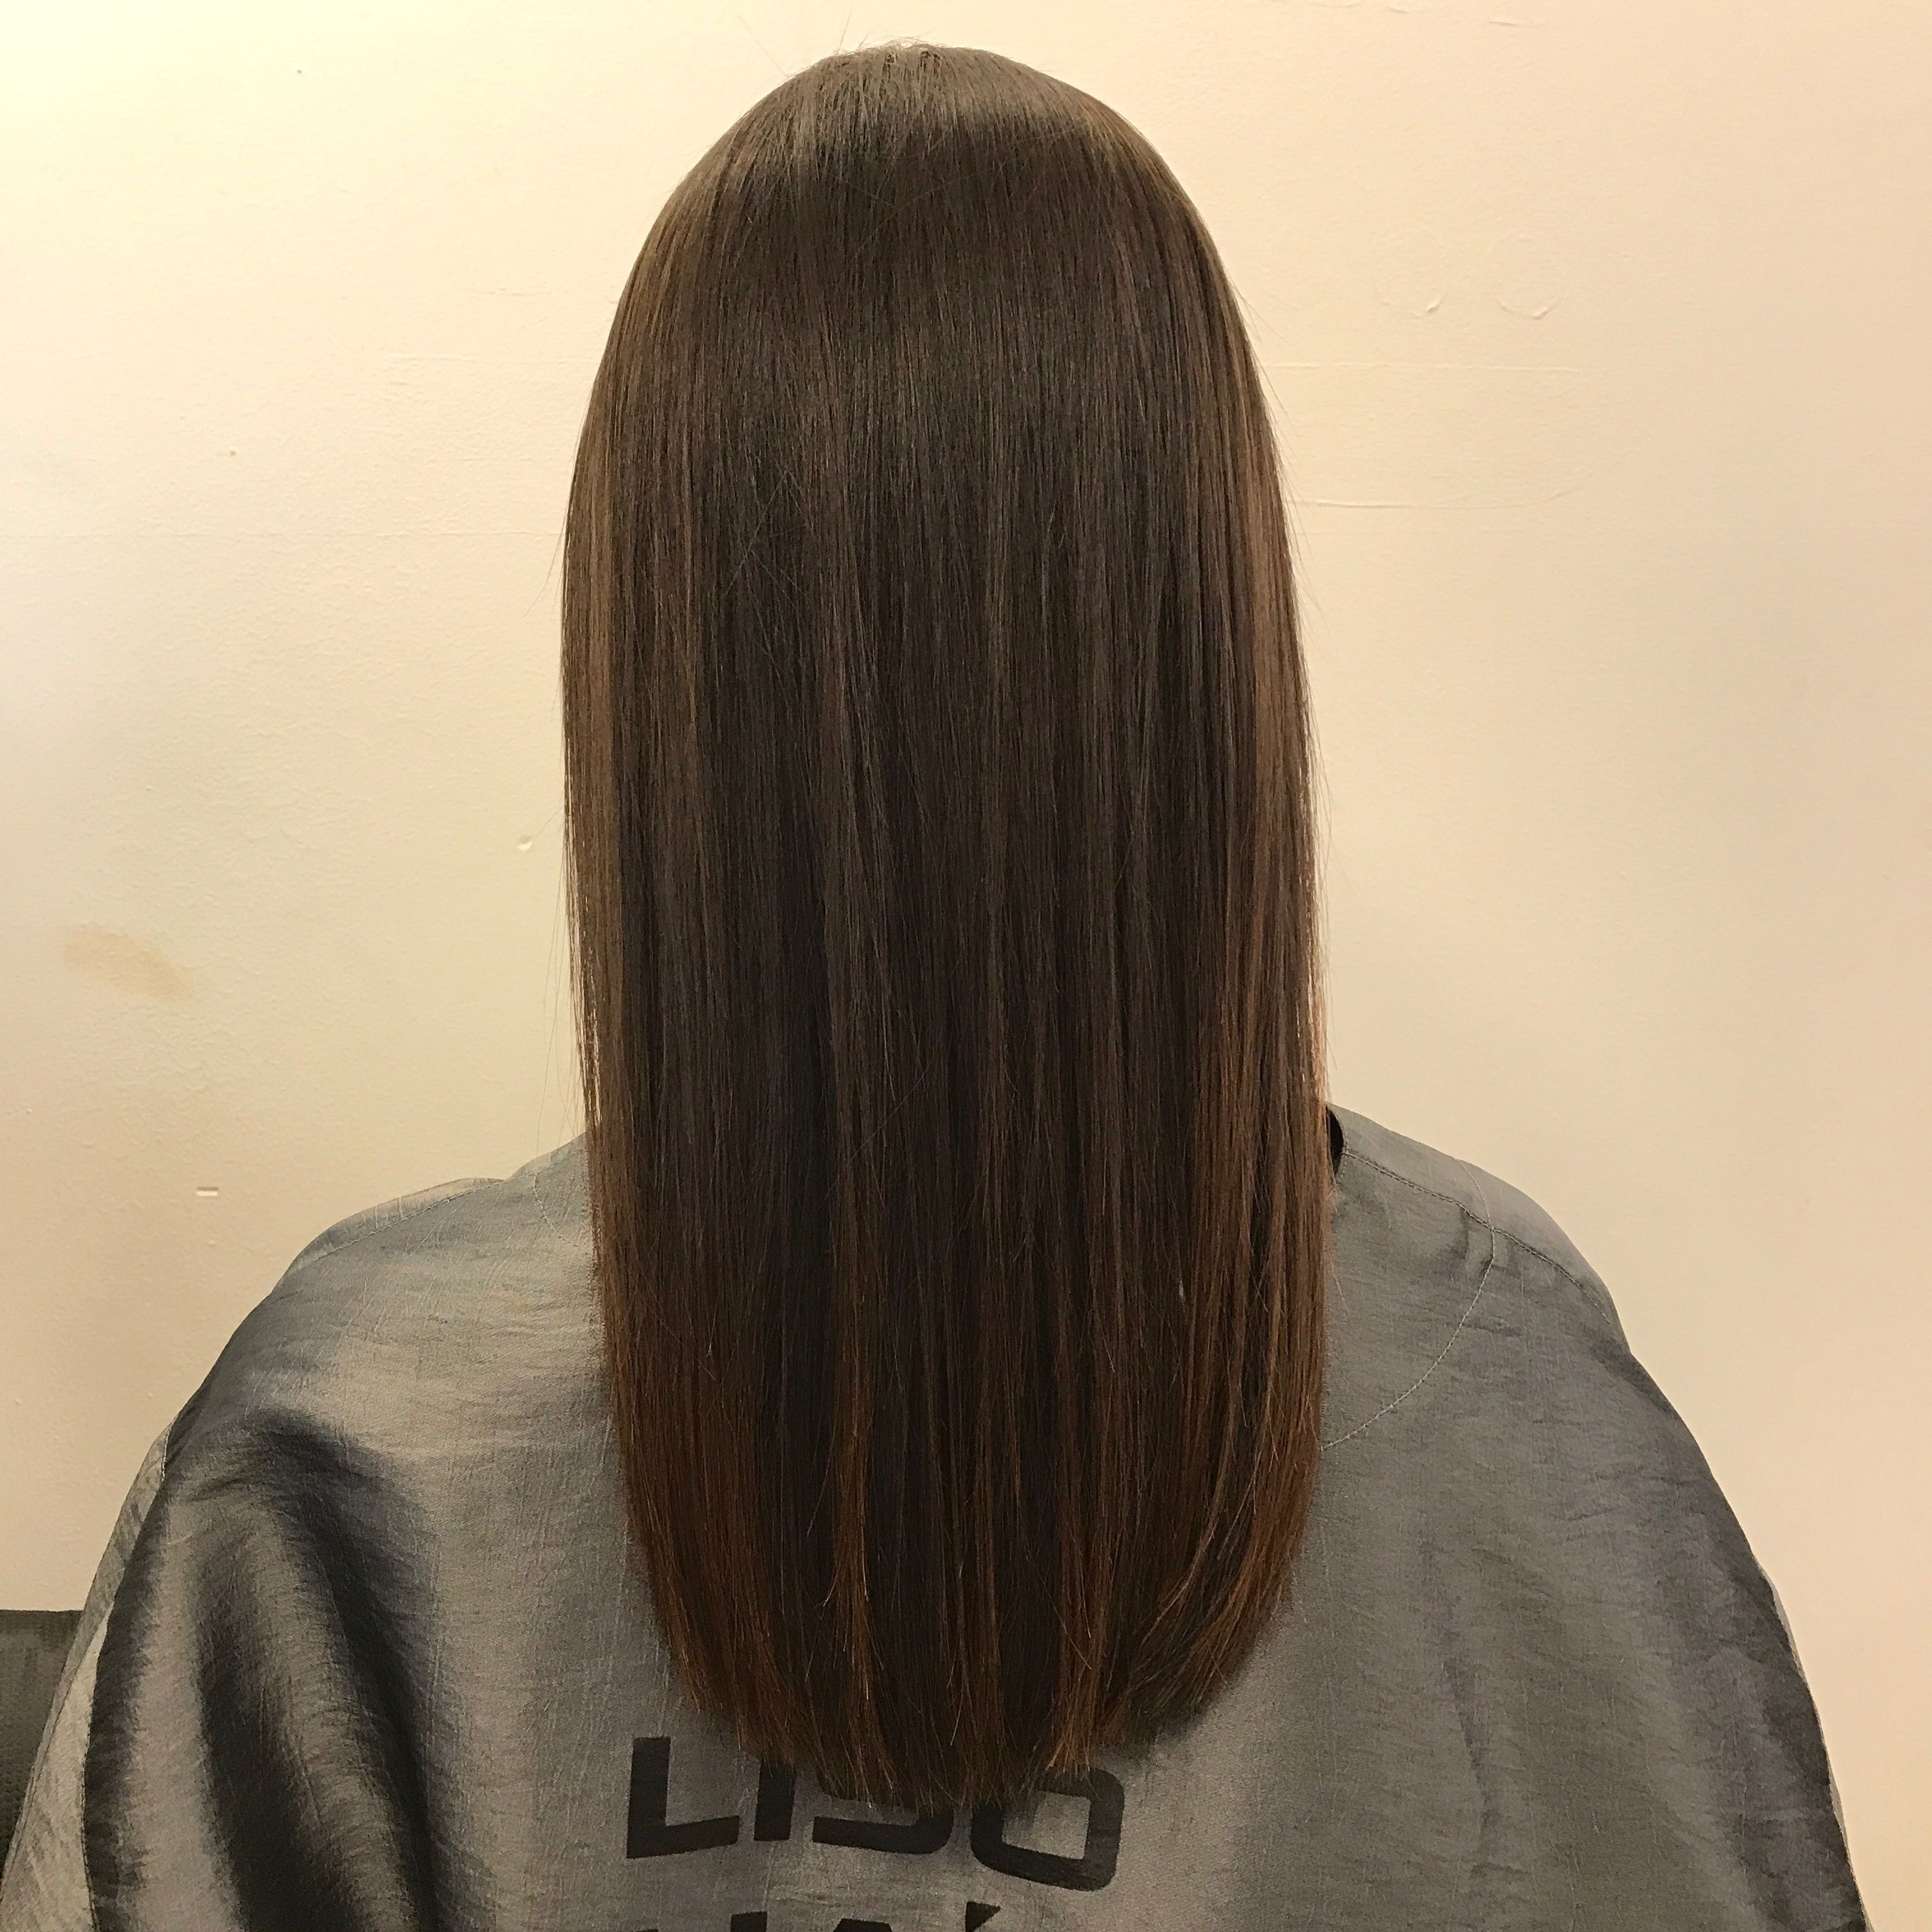 6 3 17 Straight Medium Length Dark Hair Straight Perm Sleek Dark Hair Dark Hair Medium Length Hair Straight Balayage Hair Blonde Long